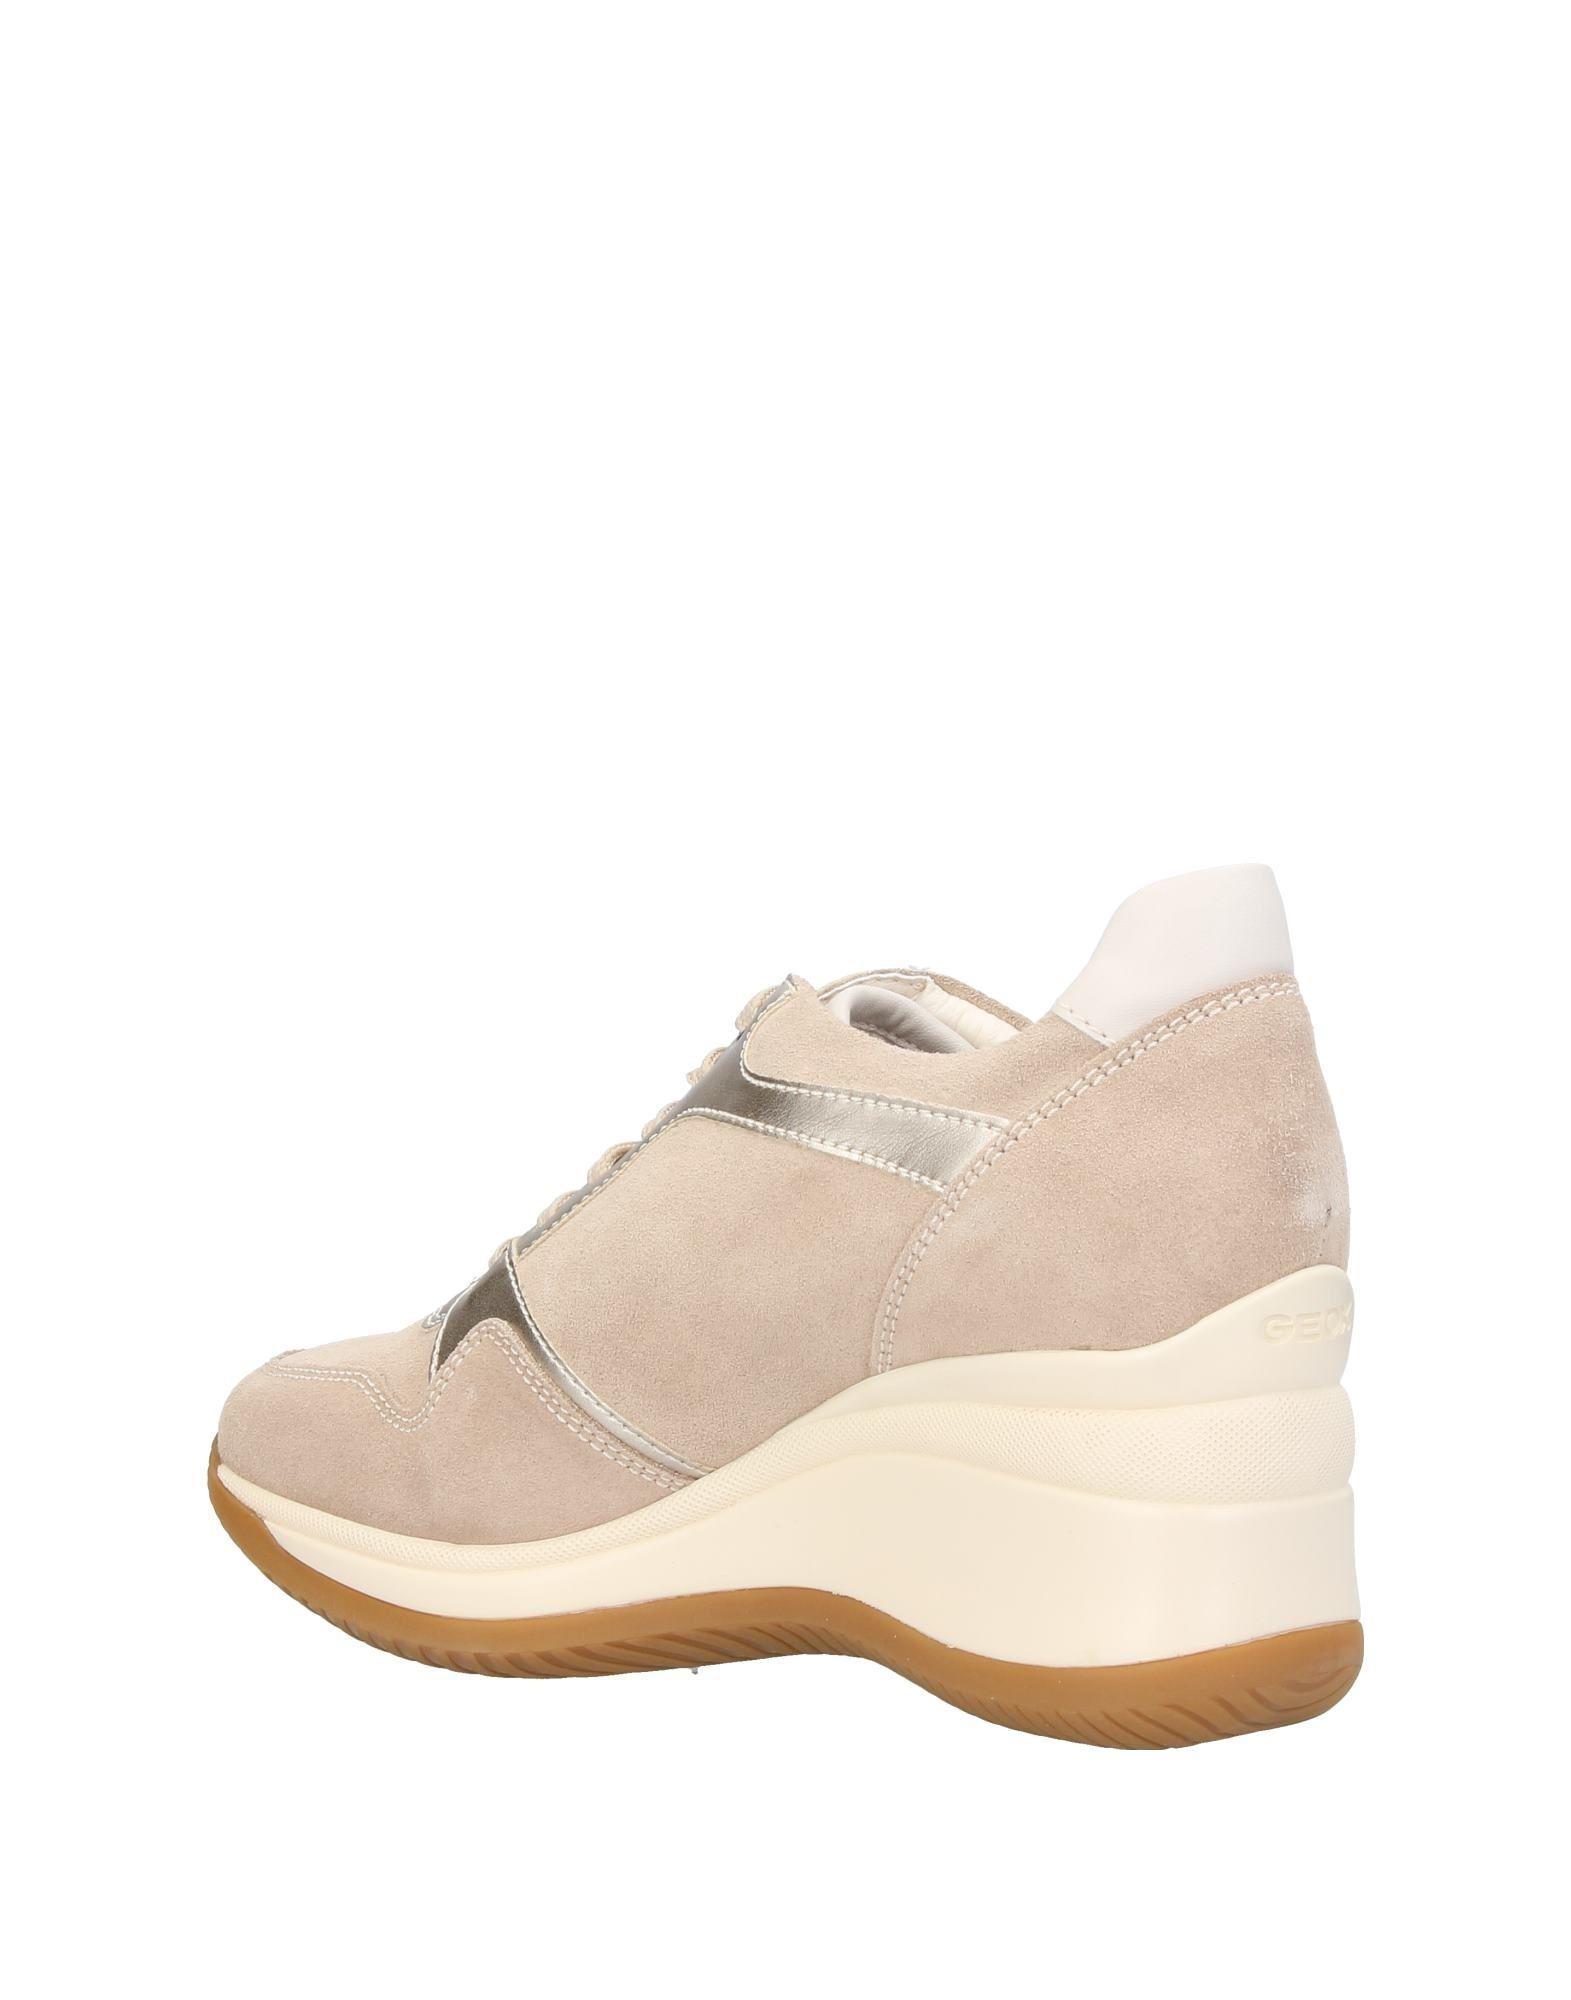 Geox Suede Low-tops & Sneakers in Beige (Natural)